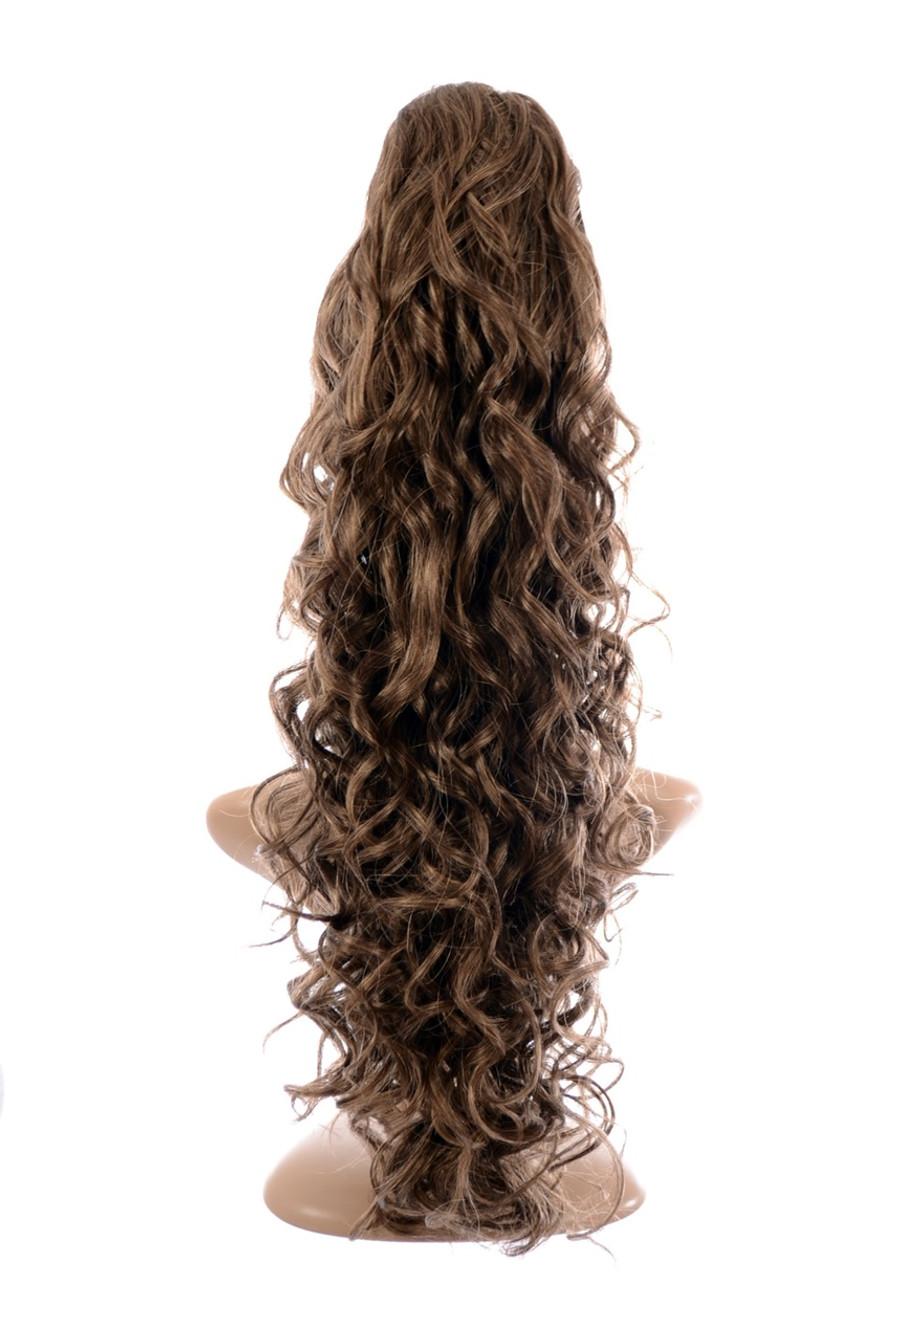 Claw Grip Ringlet Curly Hair Piece Ponytail Clip: Autumn Blonde